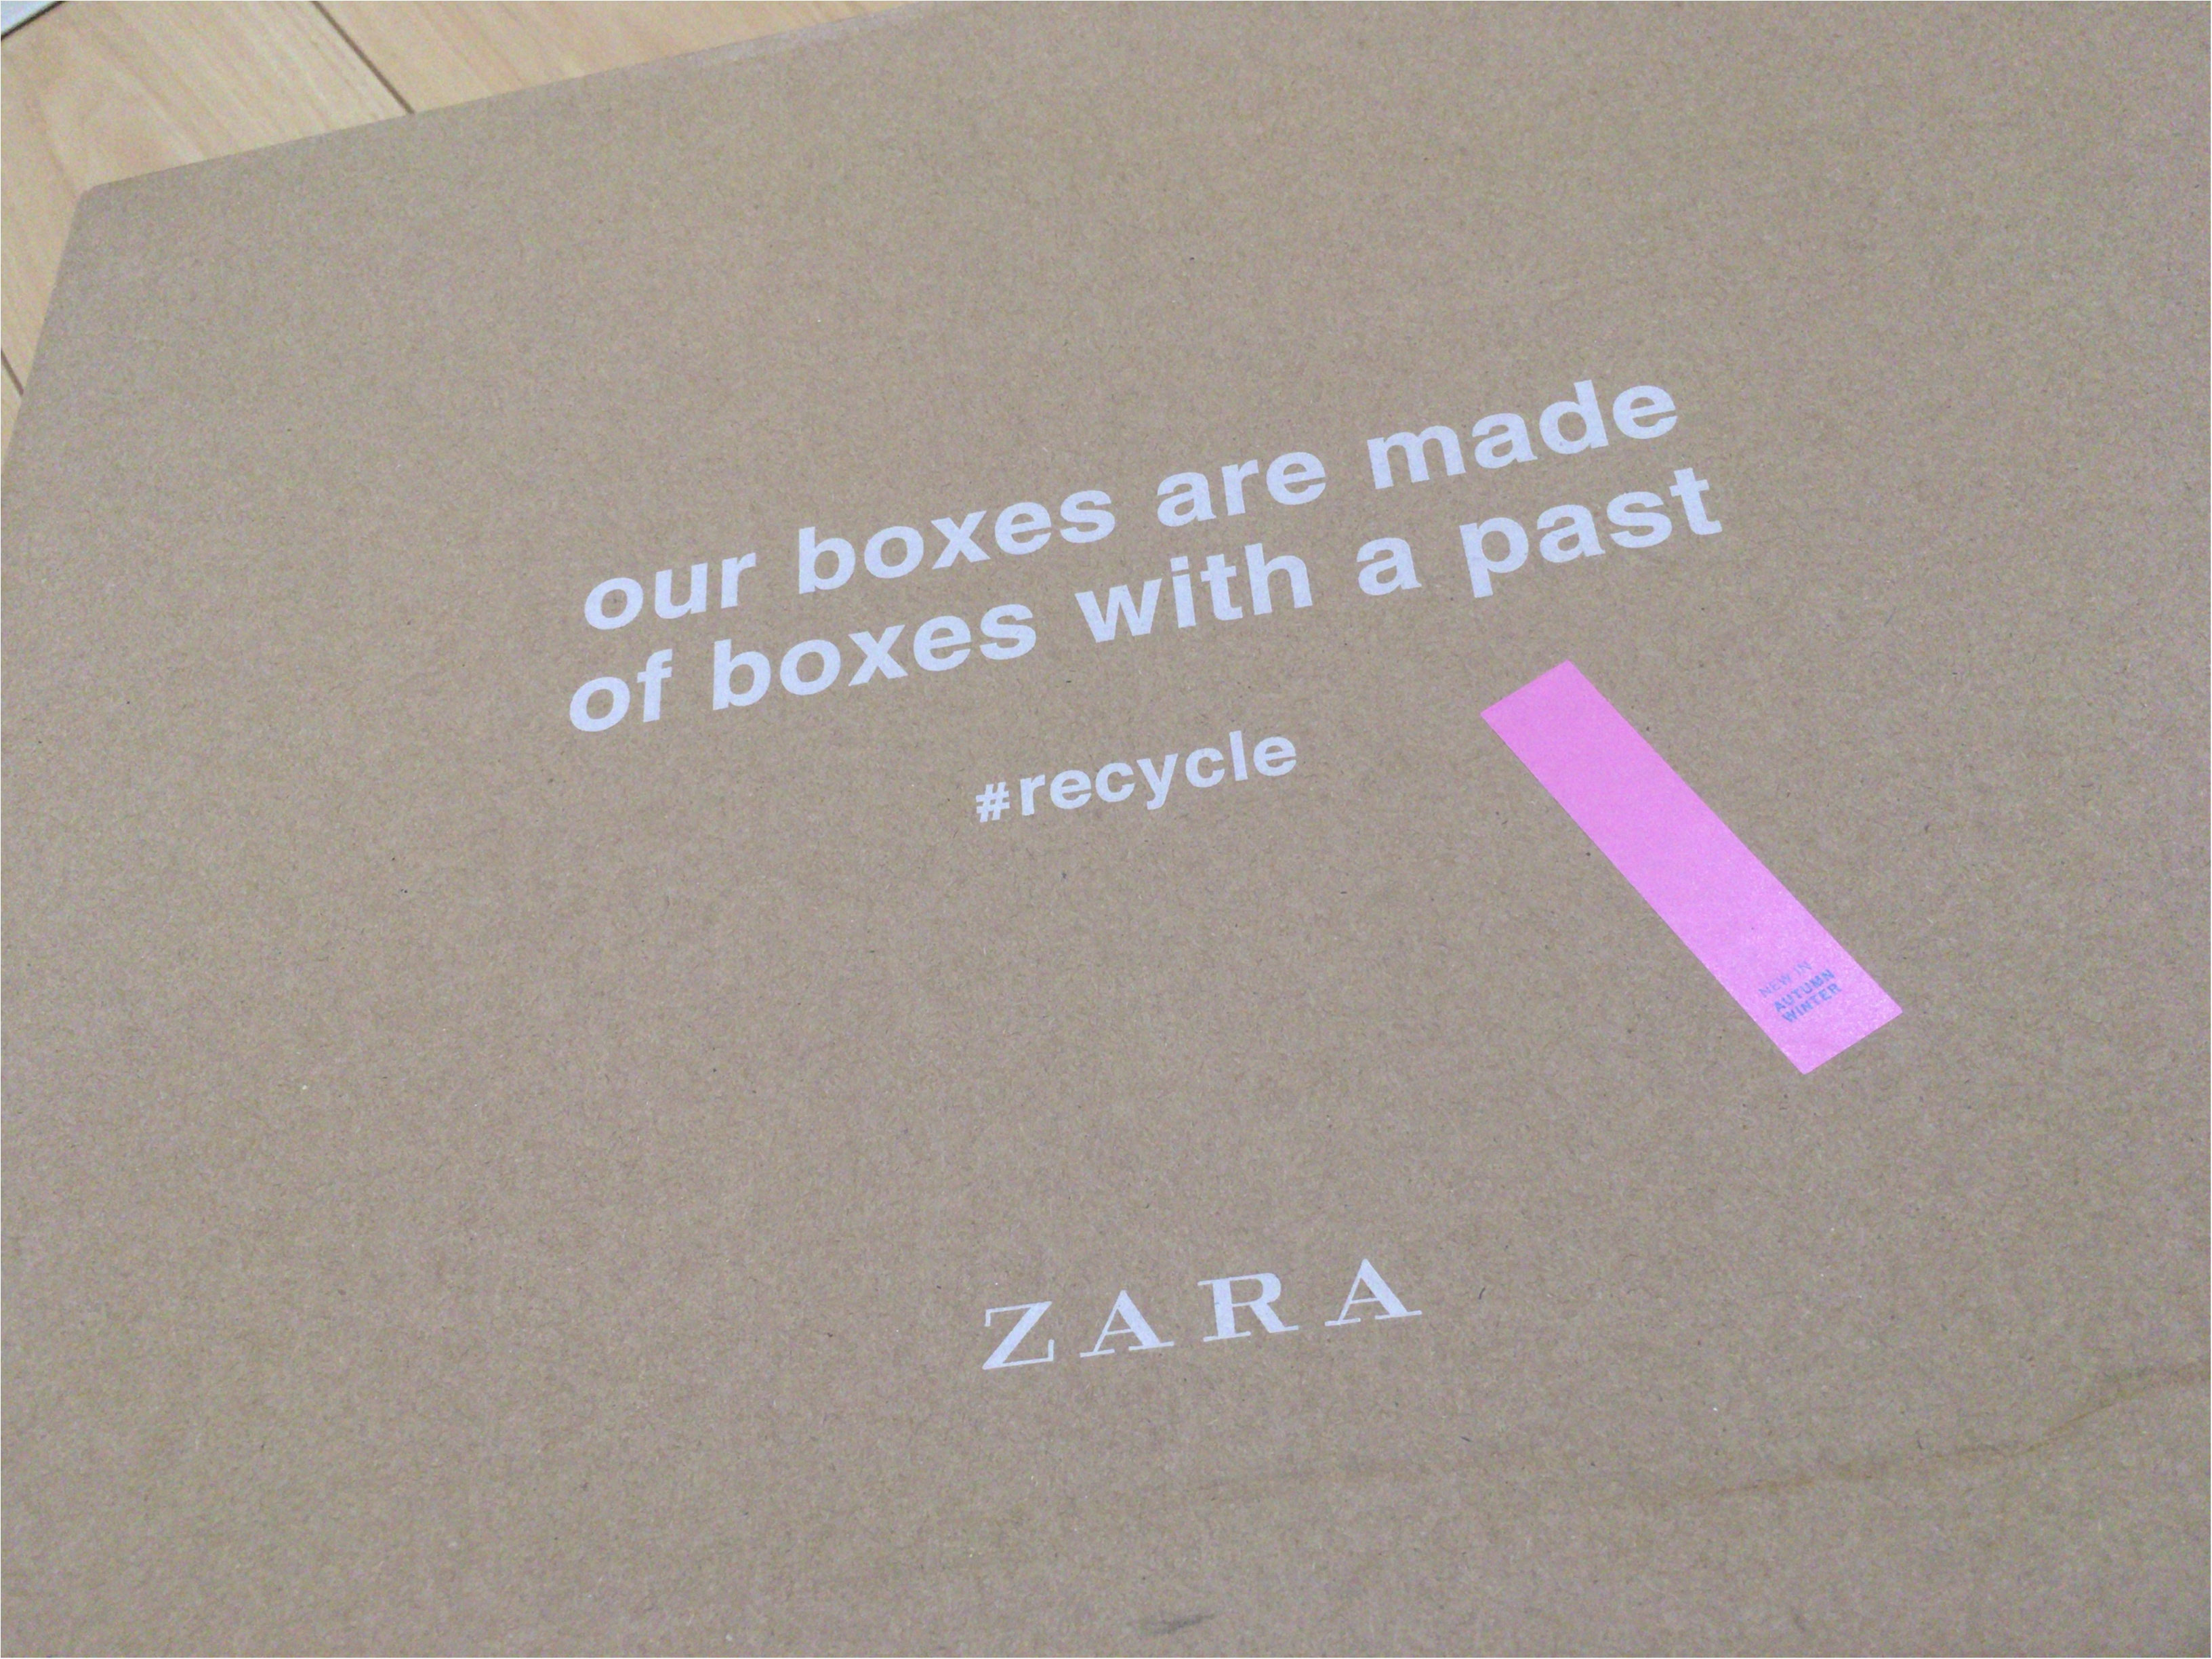 【ZARA】2990円で大人リュックGET!安いけど、お洒落で軽い大容量!普段や通勤使いにも◎_7